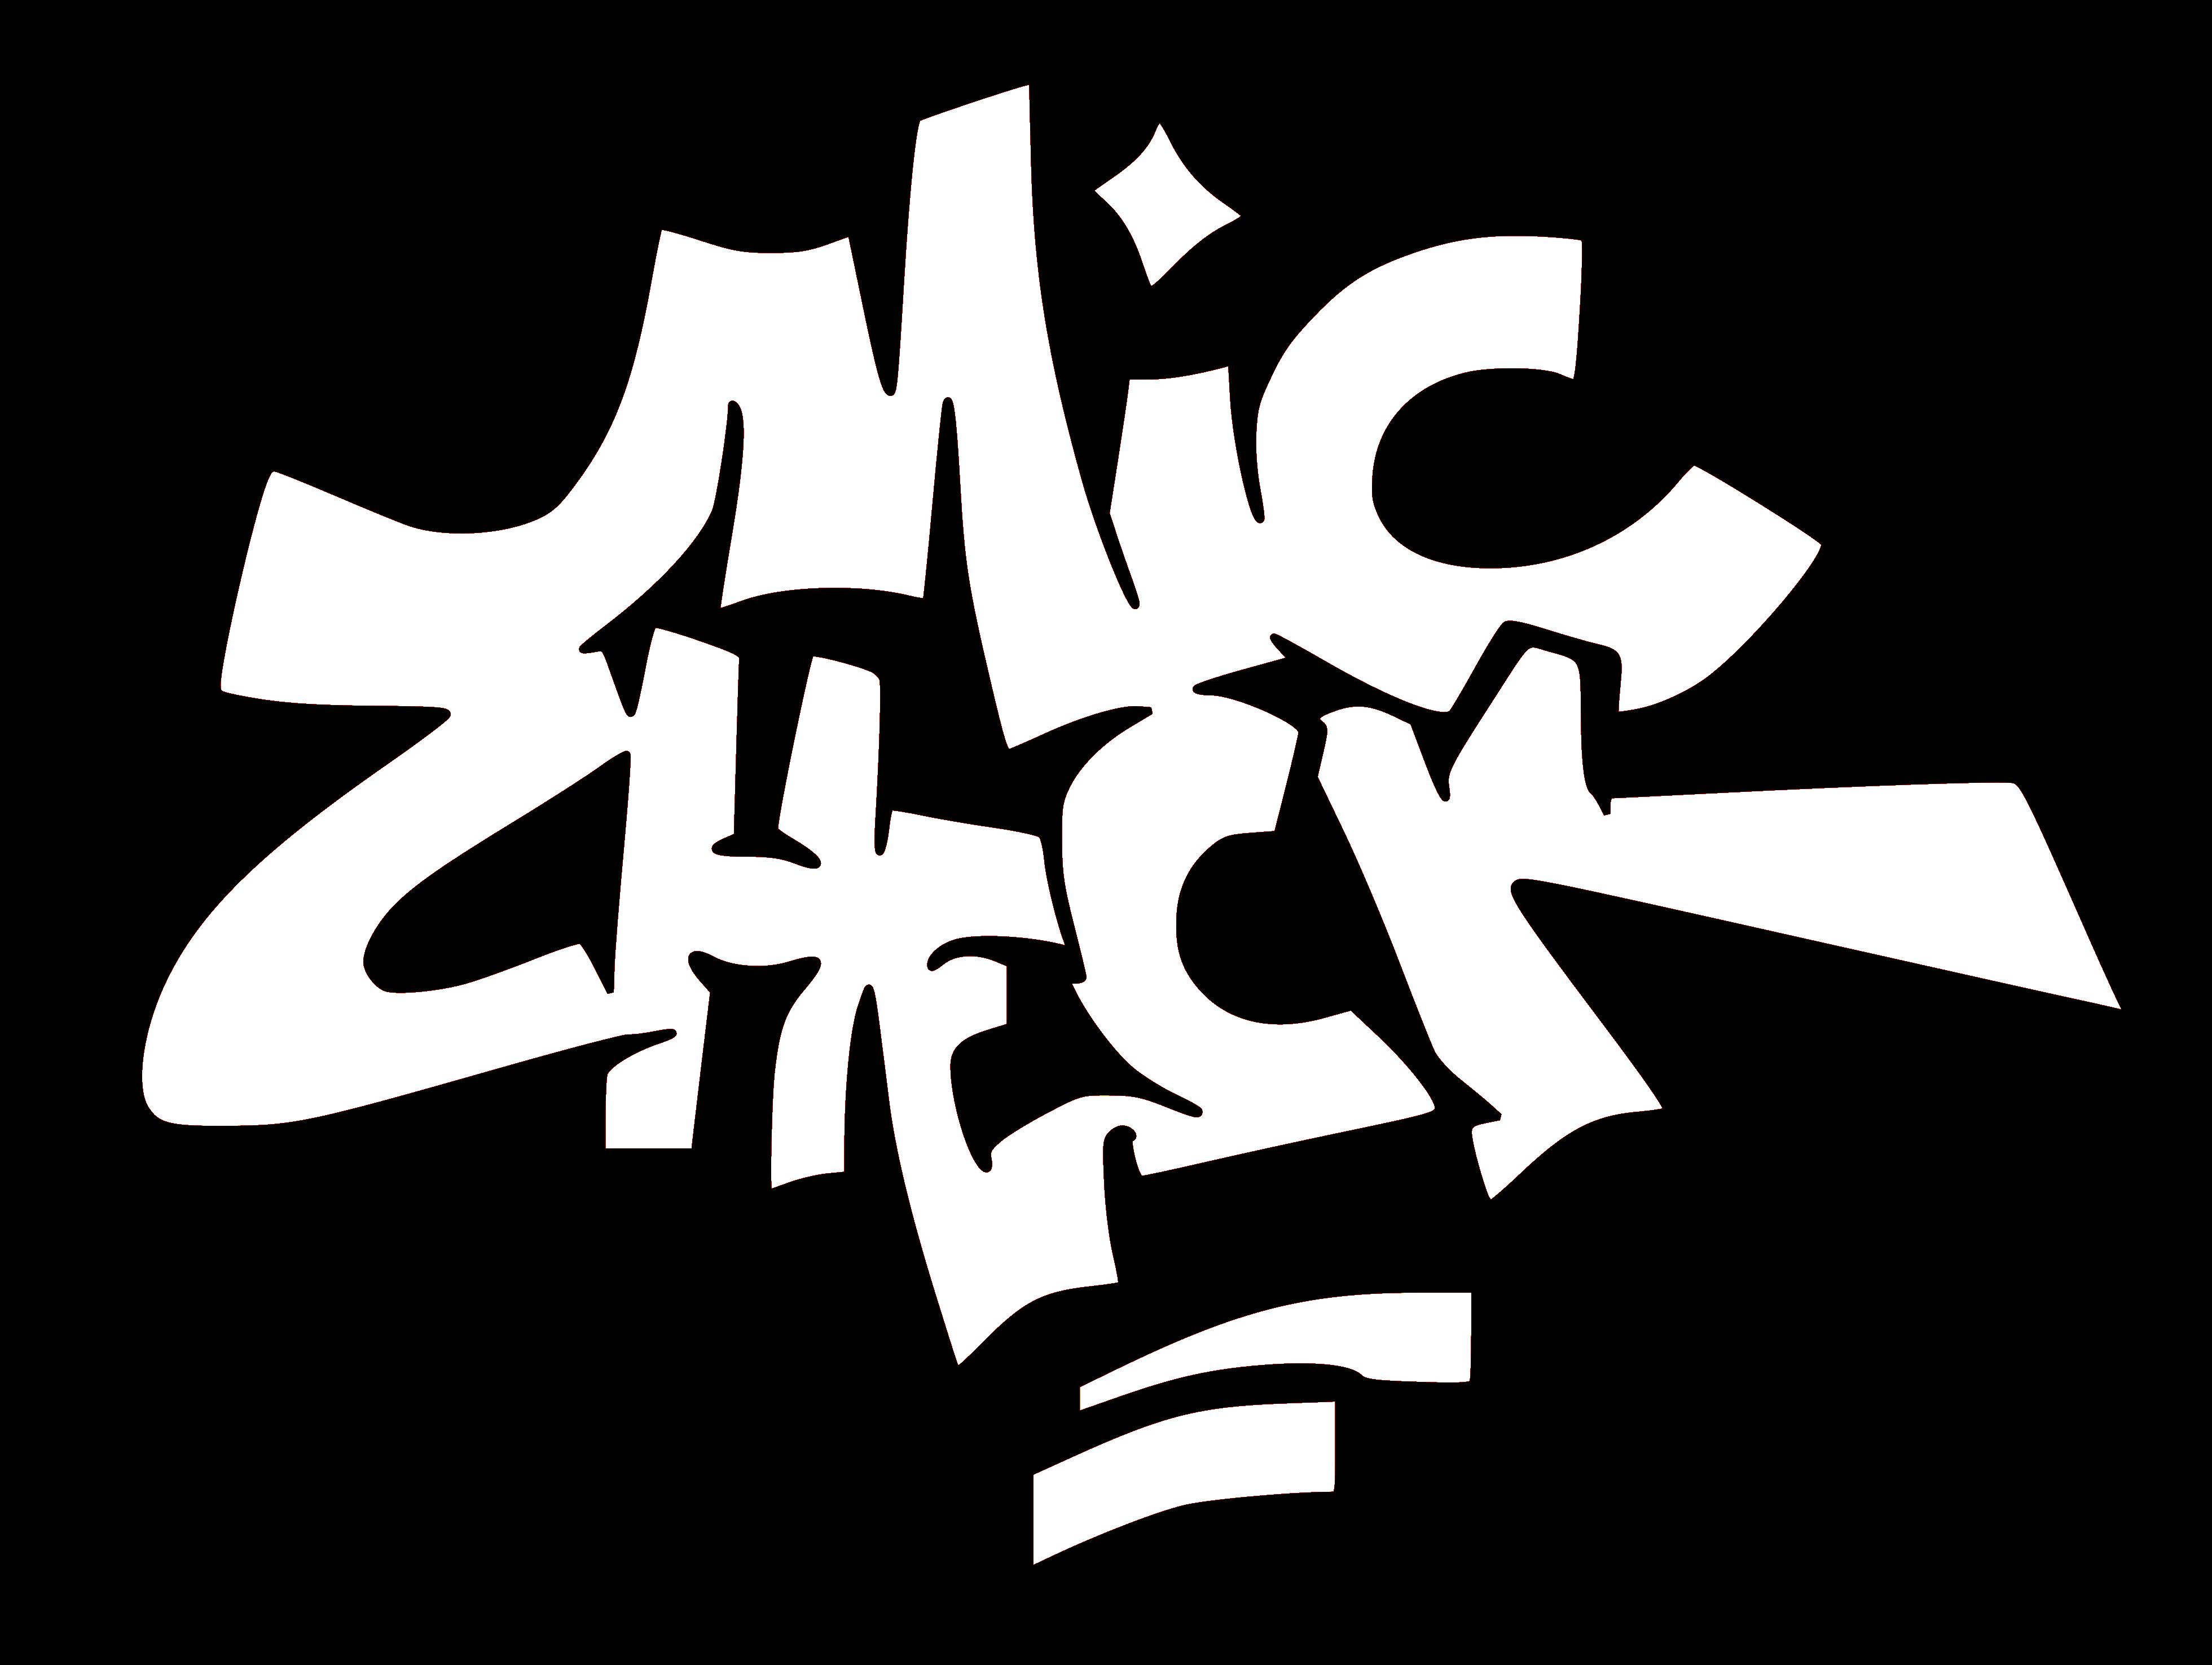 Mic Check - White